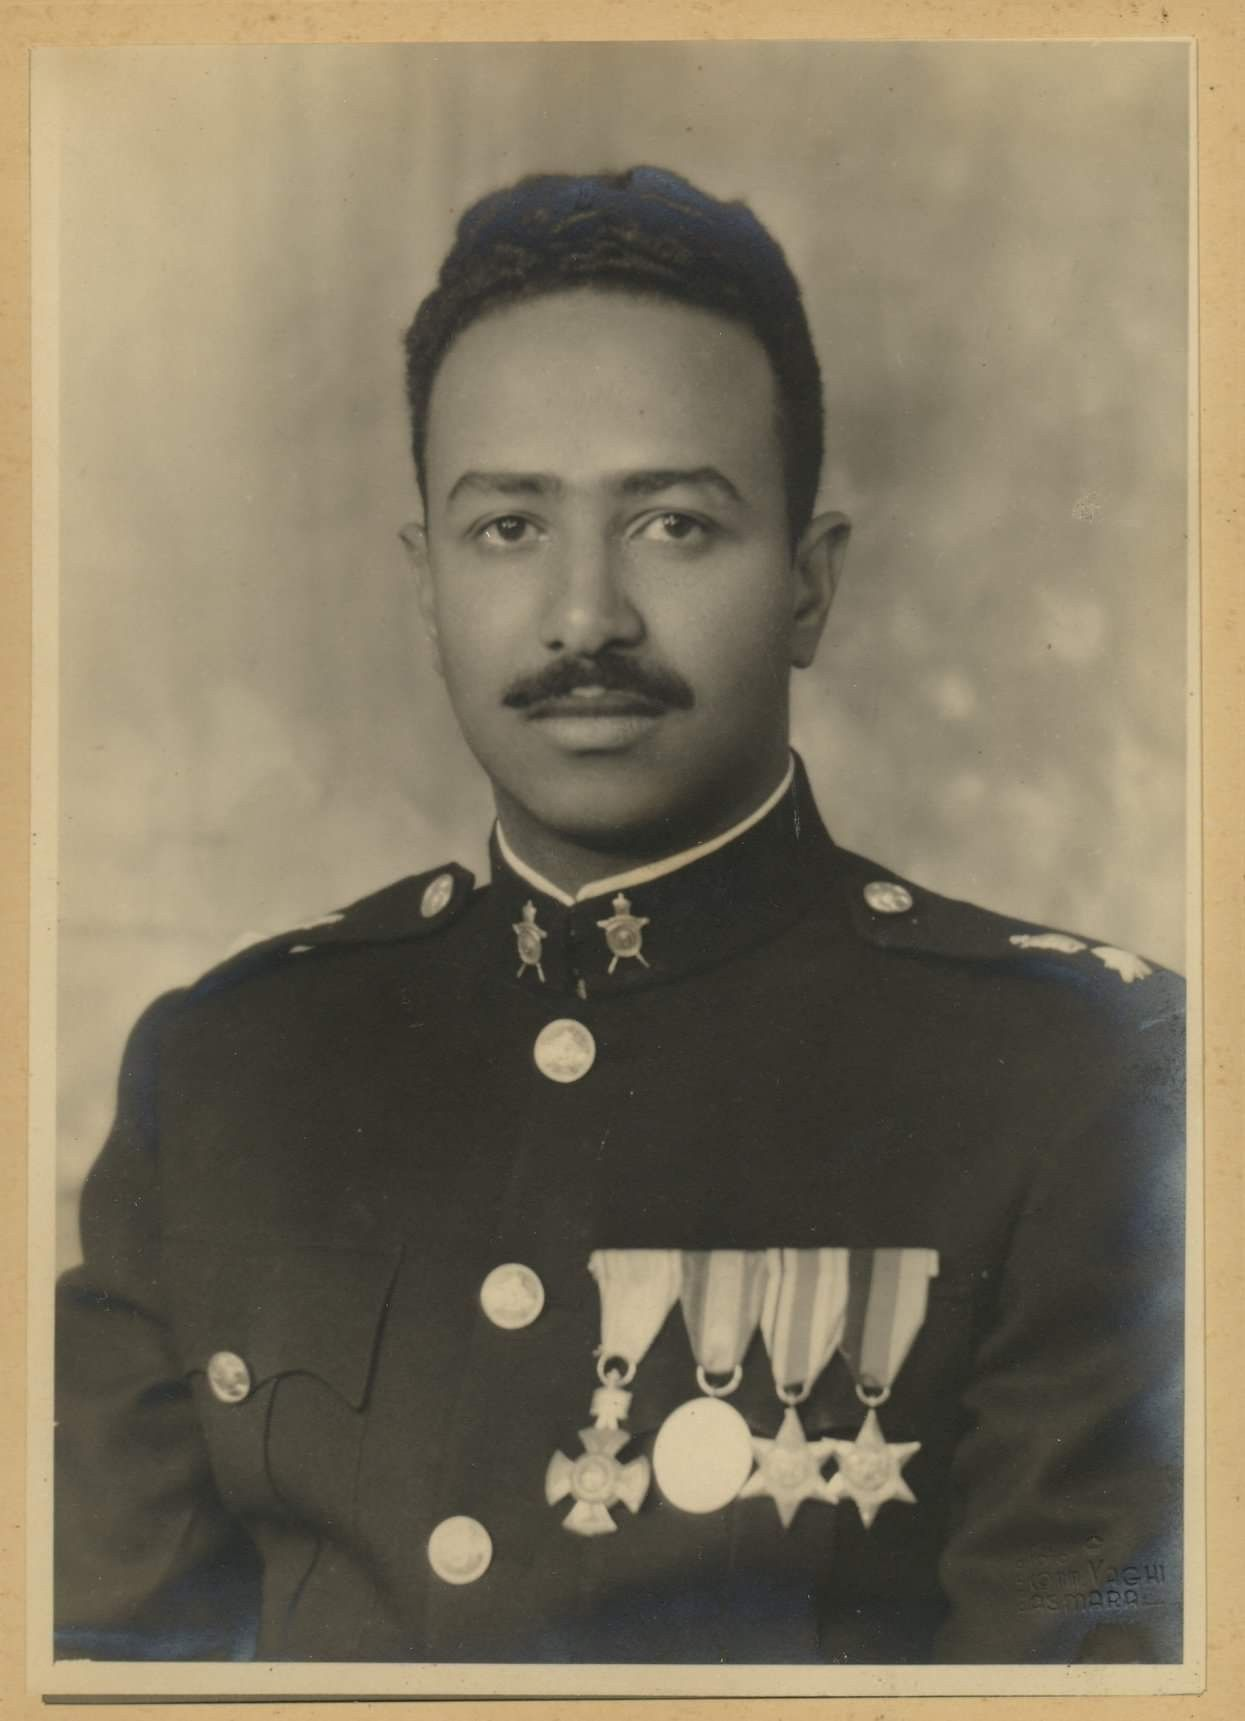 General Aman Mikel Andom History Of Ethiopia Ethiopian People Ethiopia